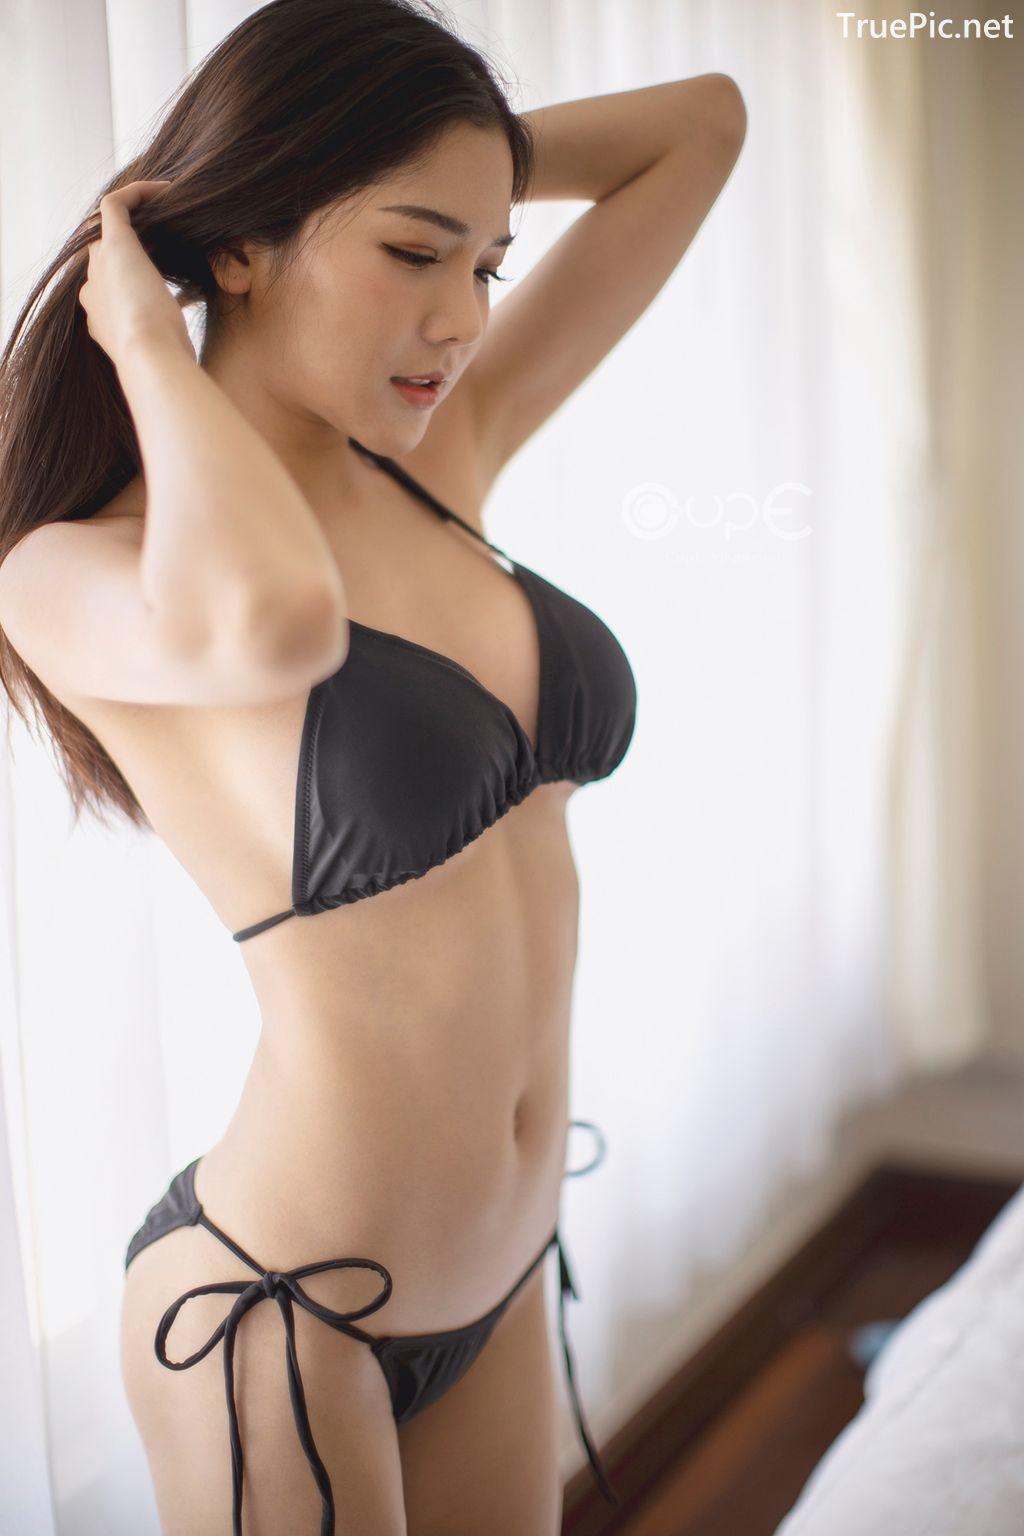 Image-Thailand-Model-Phitchamol-Srijantanet-Black-Bikini-TruePic.net- Picture-6